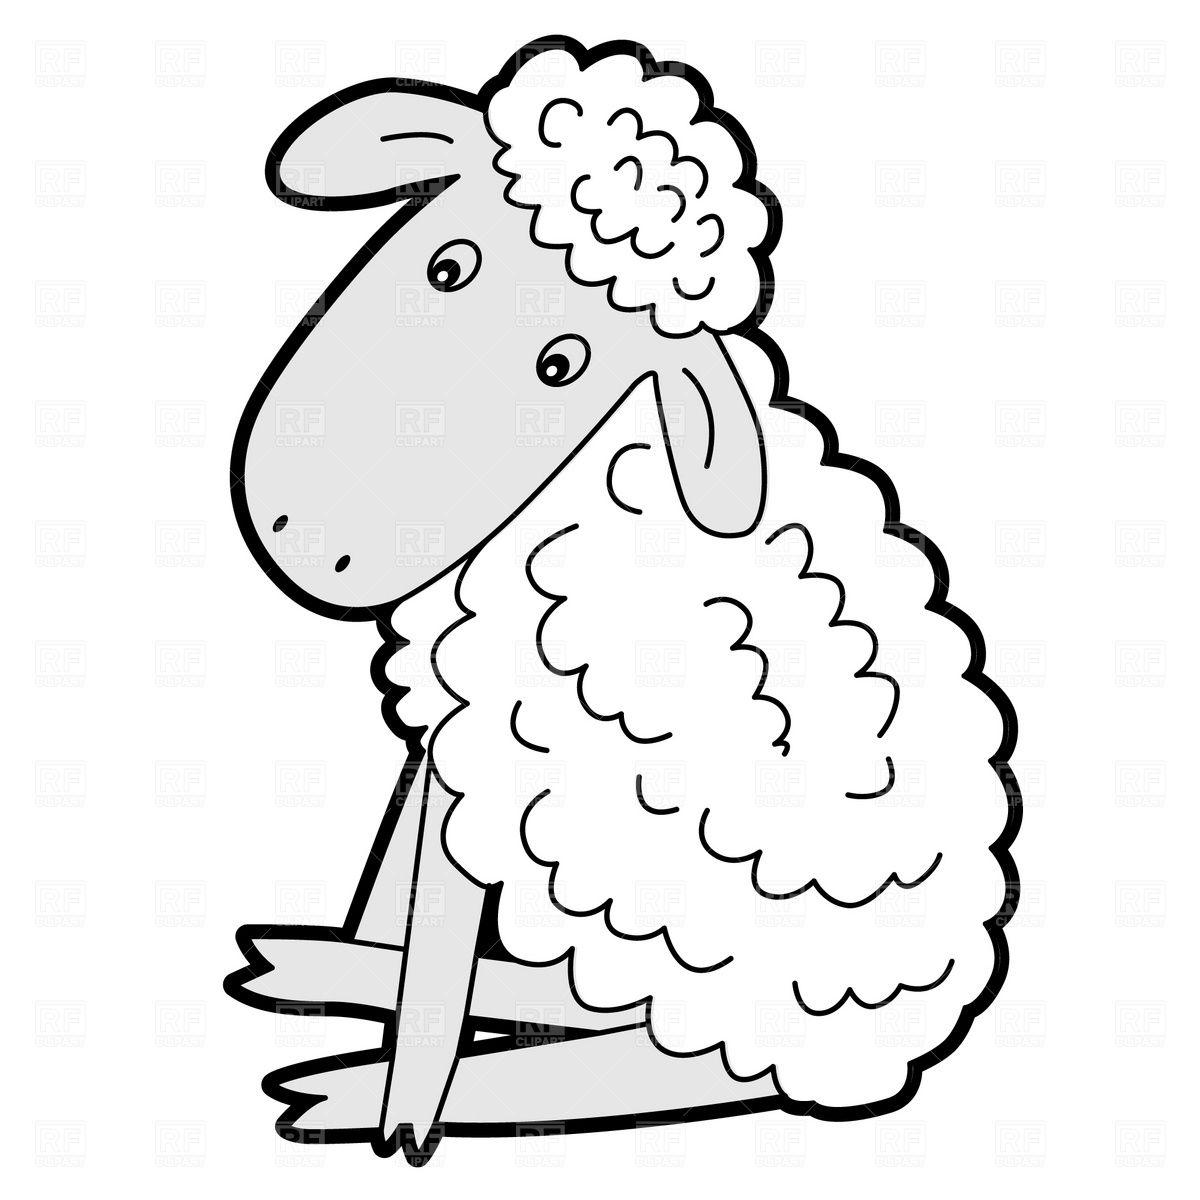 Lamb clipart vertebrate. Free panda images